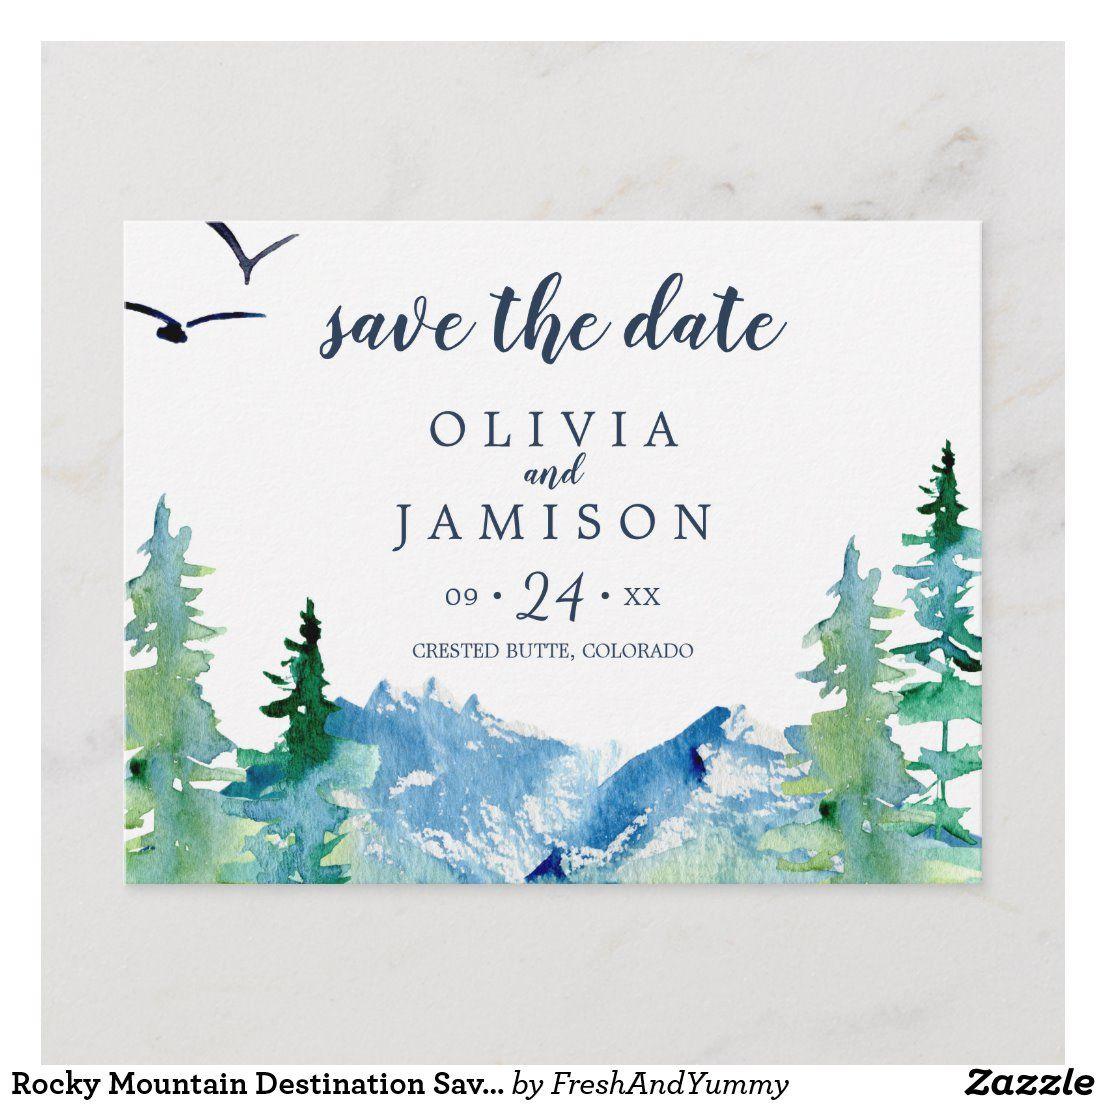 Rocky Mountain Destination Save the Date Postcard Zazzle